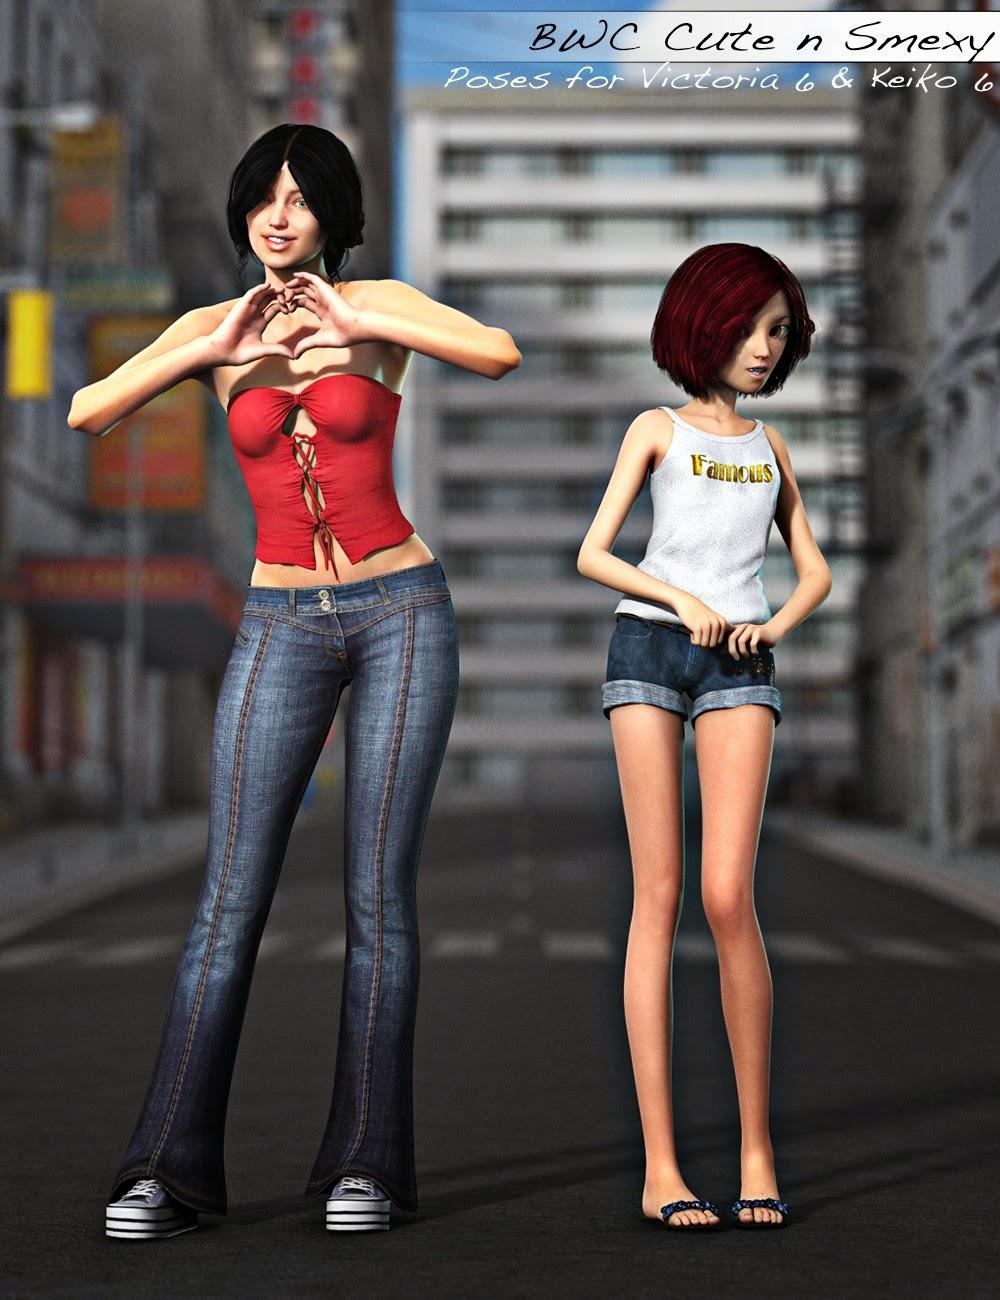 BWC Mignon n Smexy - Poses de Victoria 6 et Keiko 6